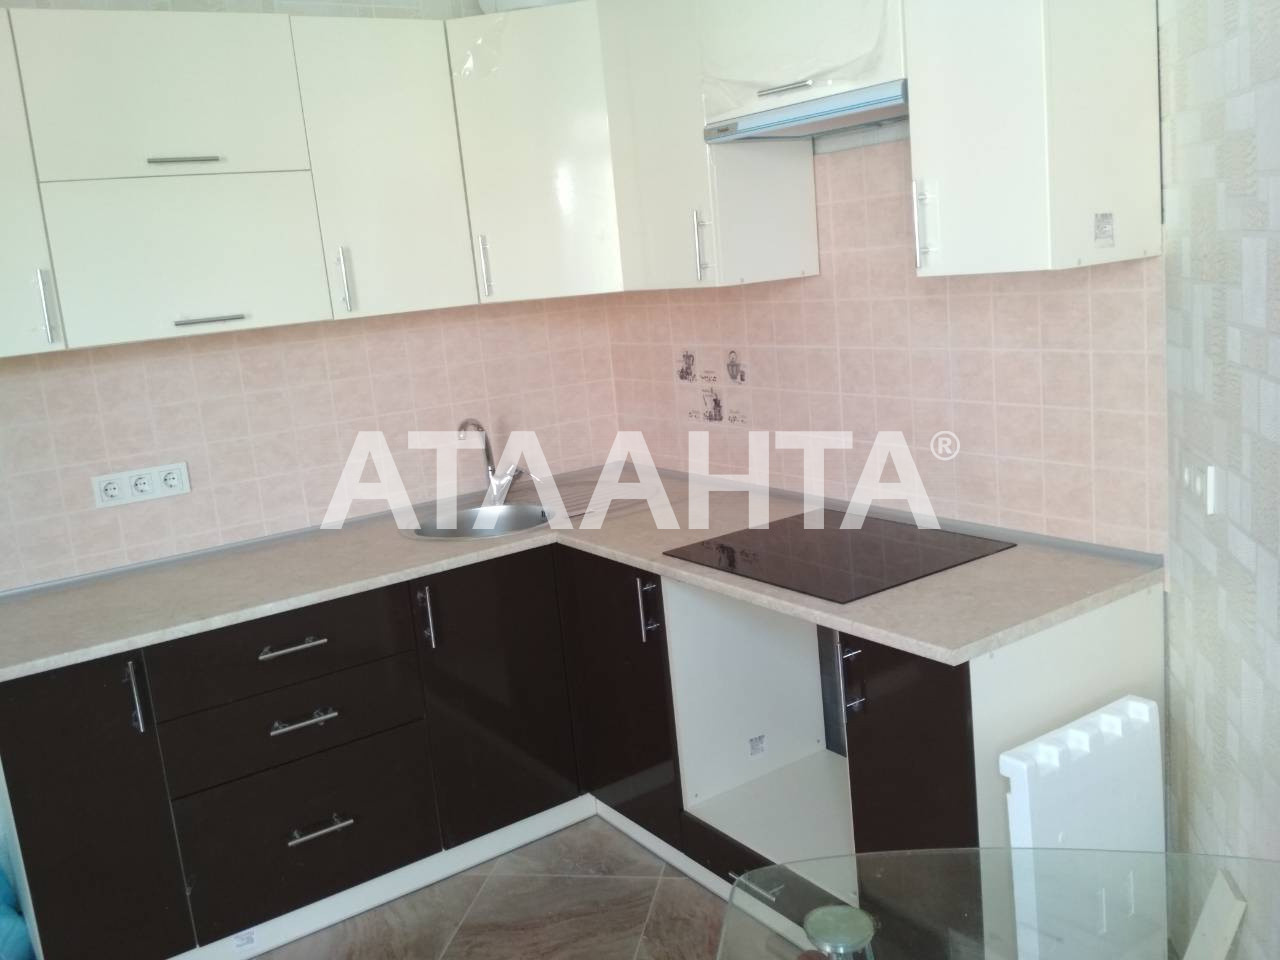 Продается 1-комнатная Квартира на ул. Радужный М-Н — 37 500 у.е. (фото №5)